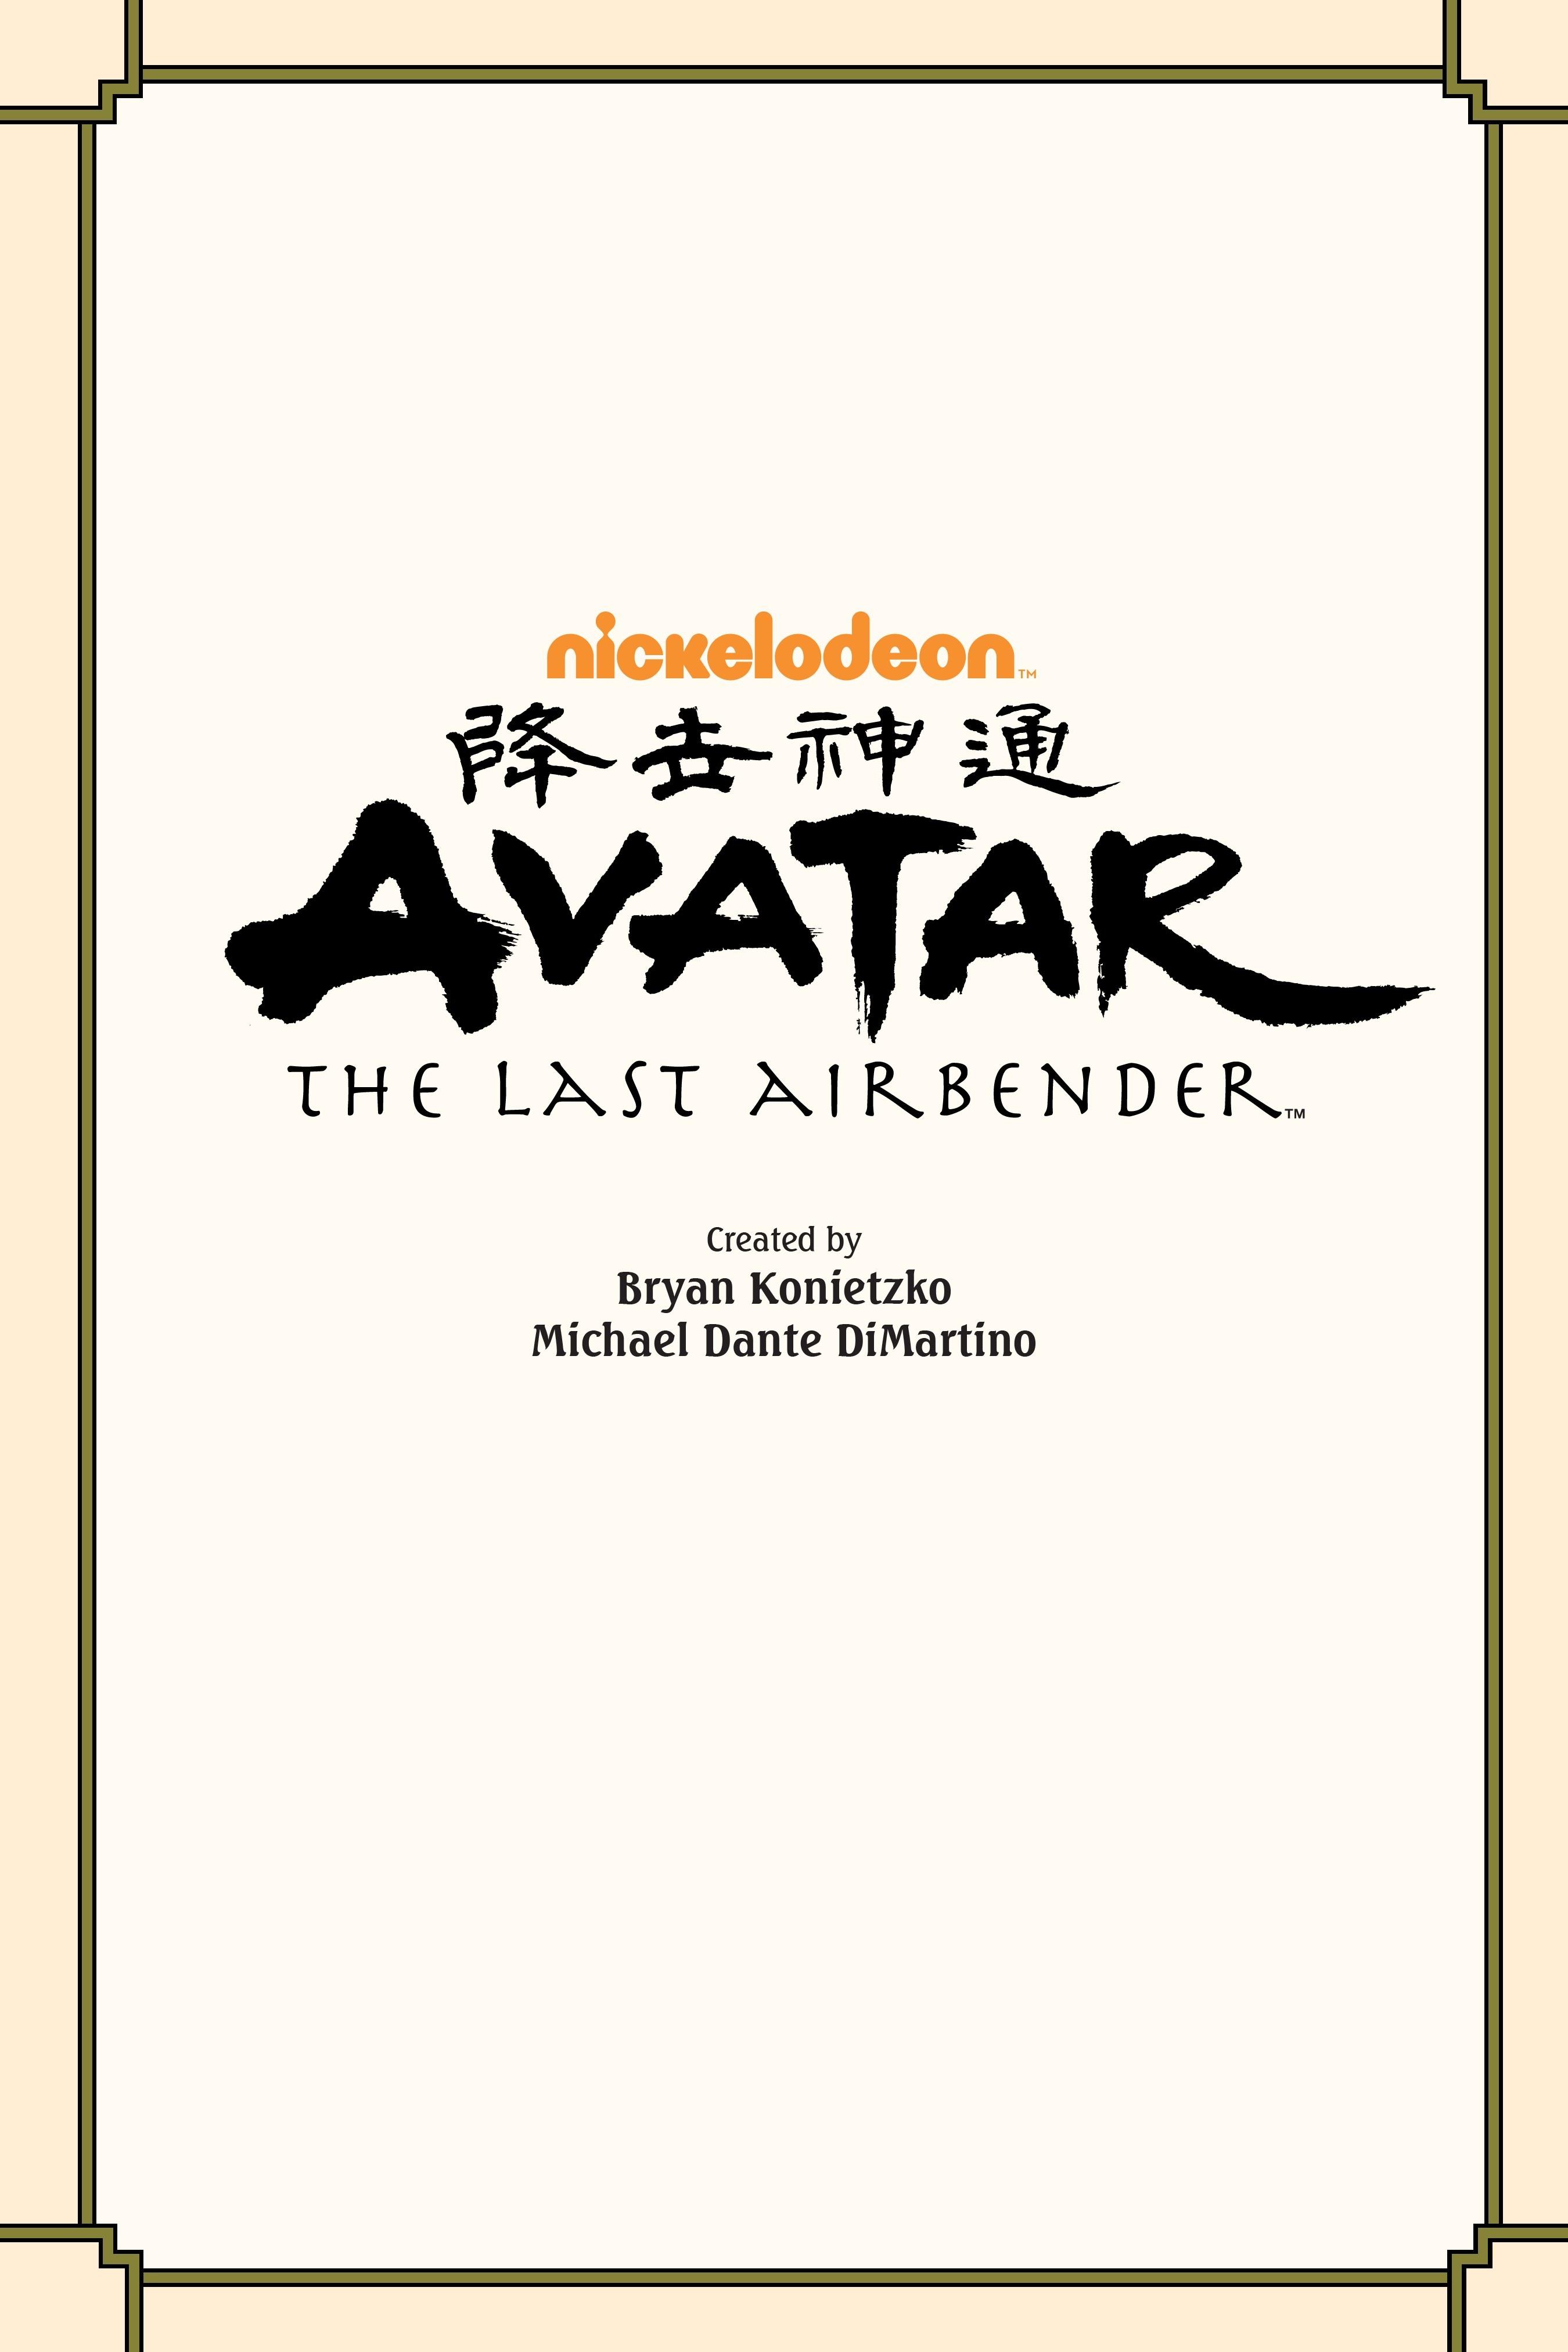 Nickelodeon Avatar: The Last Airbender - Imbalance TPB_2 Page 1